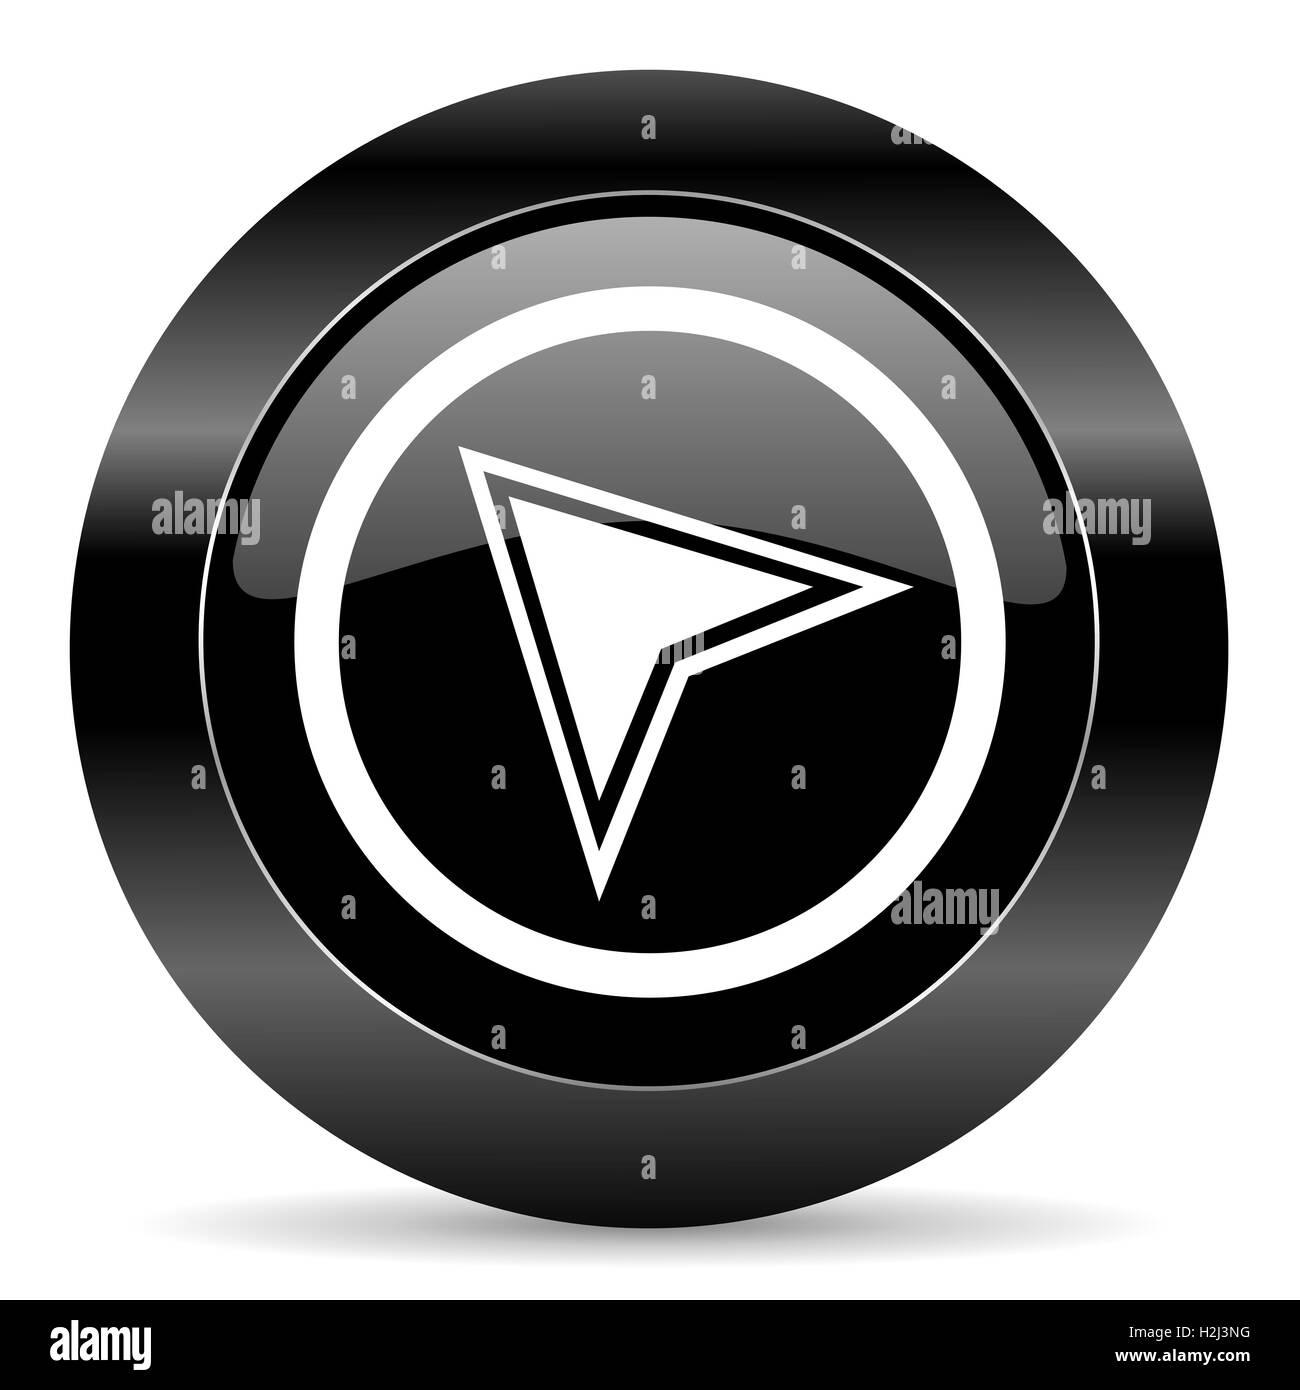 navigation icon - Stock Image